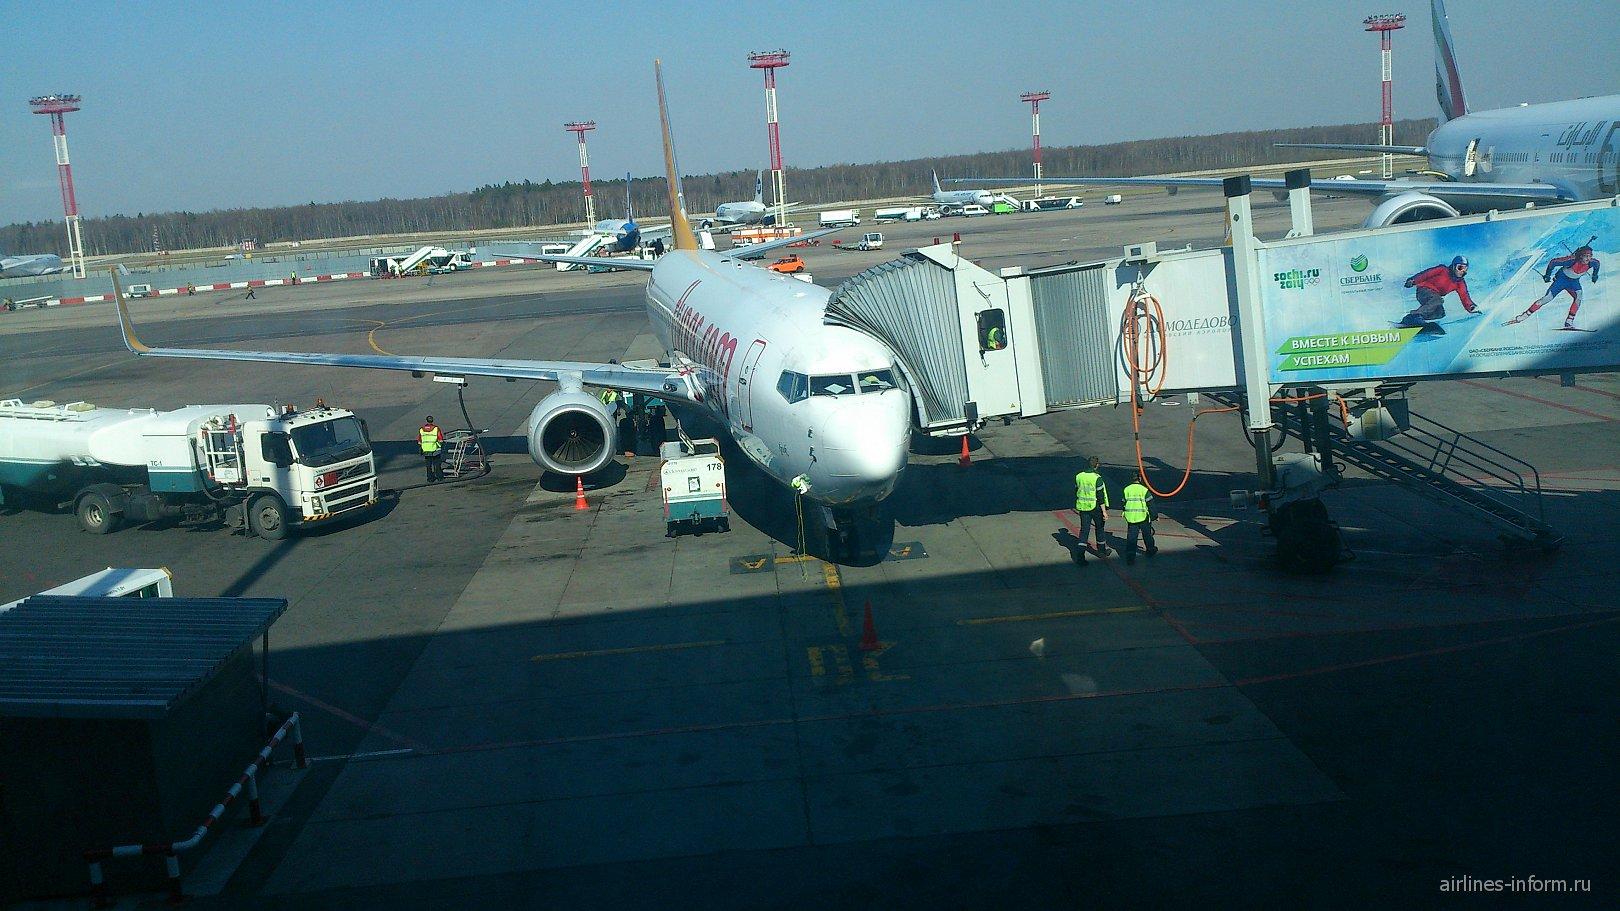 Боинг-737-800 авиакомпании Пегасус в аэропорту Домодедово